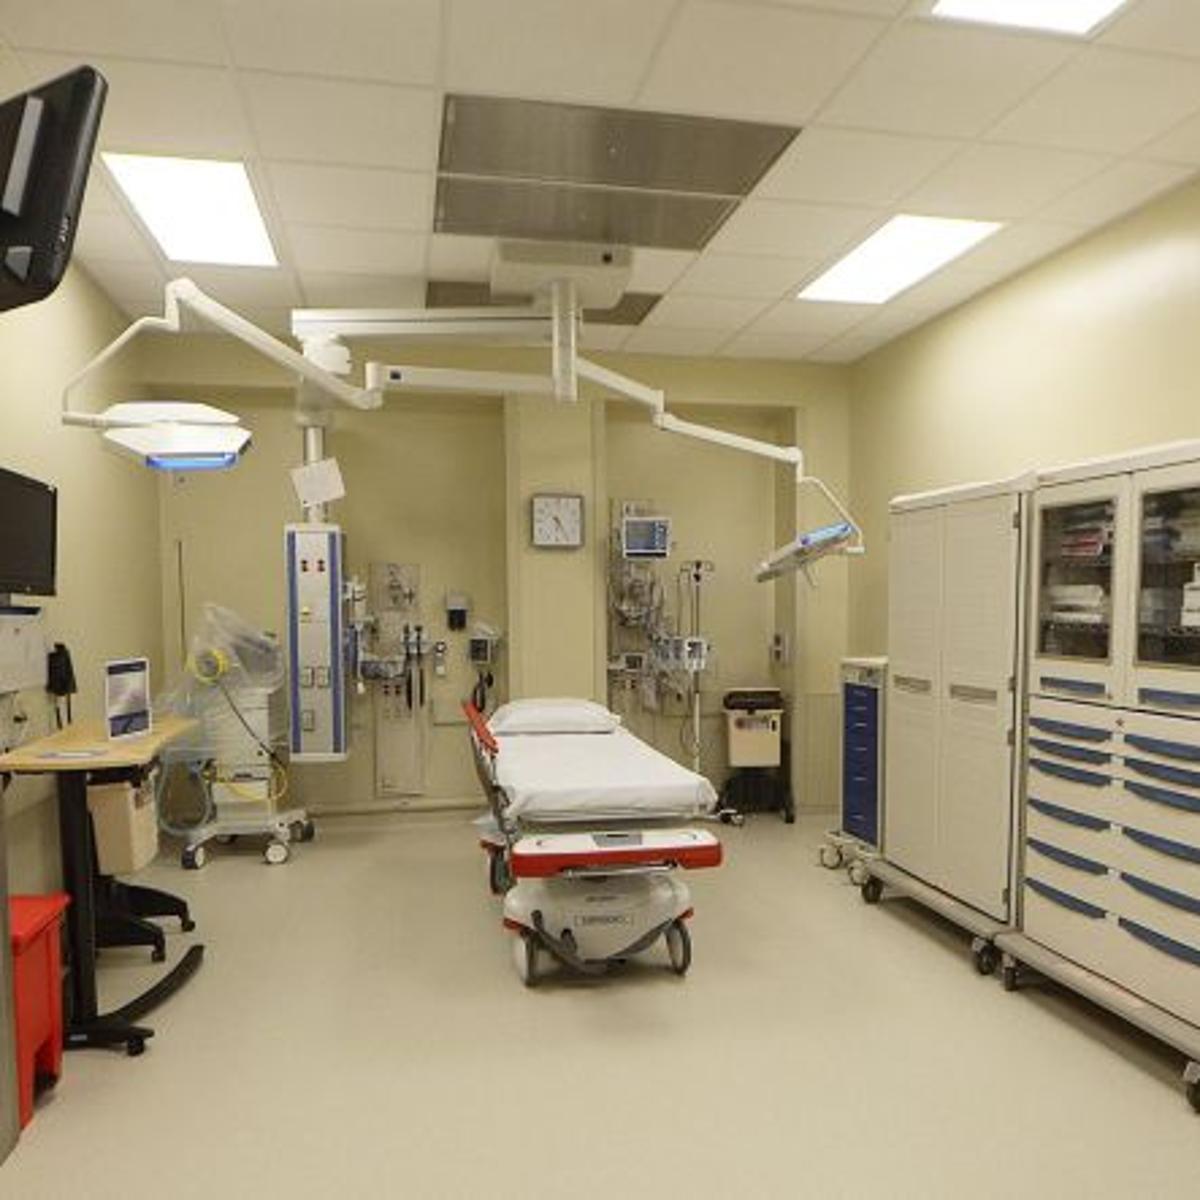 West Shore Hospital prepares to open its doors Monday